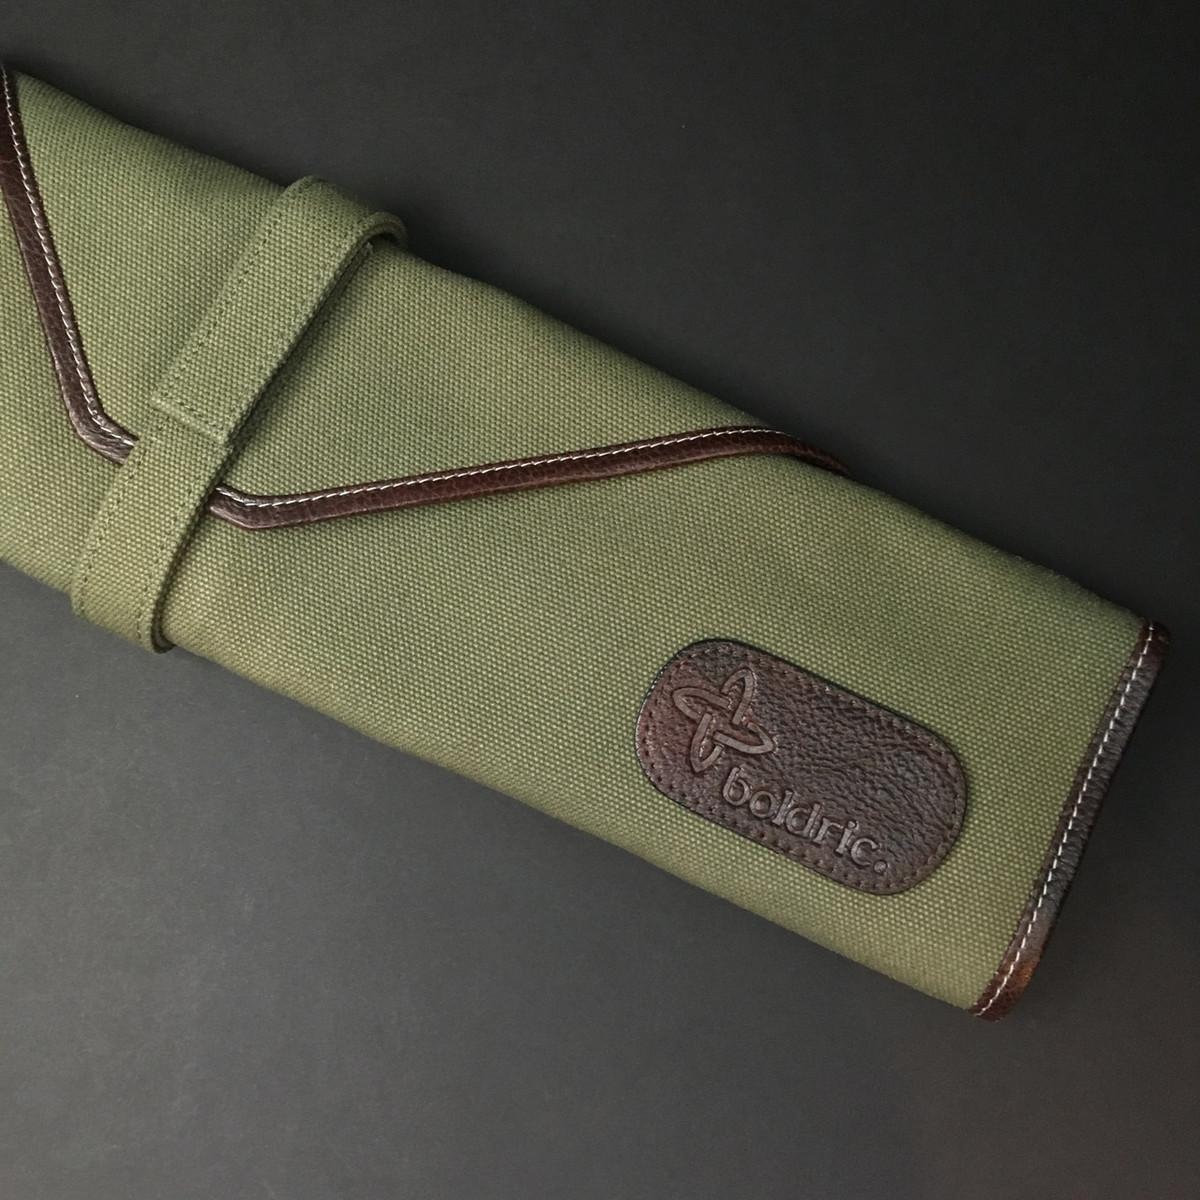 Boldric   6 pocket knife roll   Green